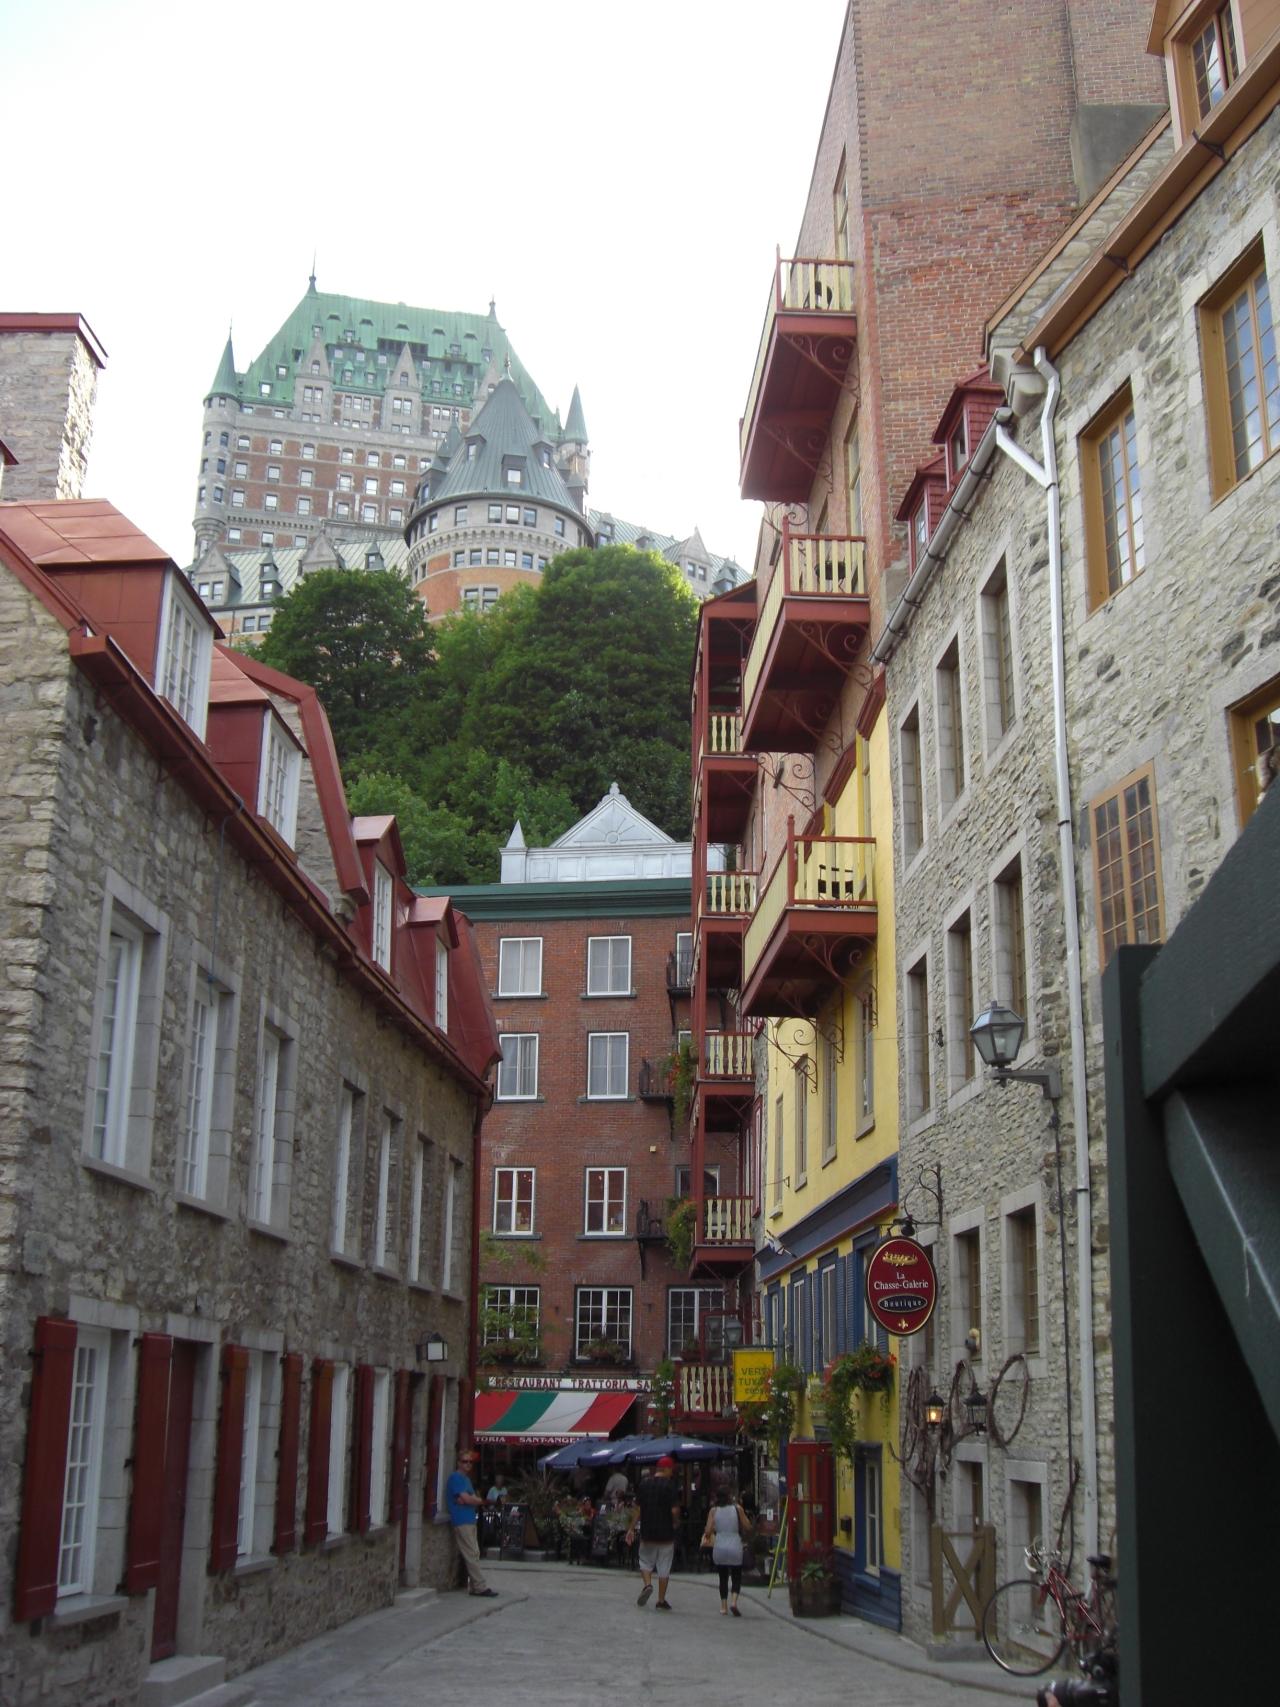 Blick auf Chateau